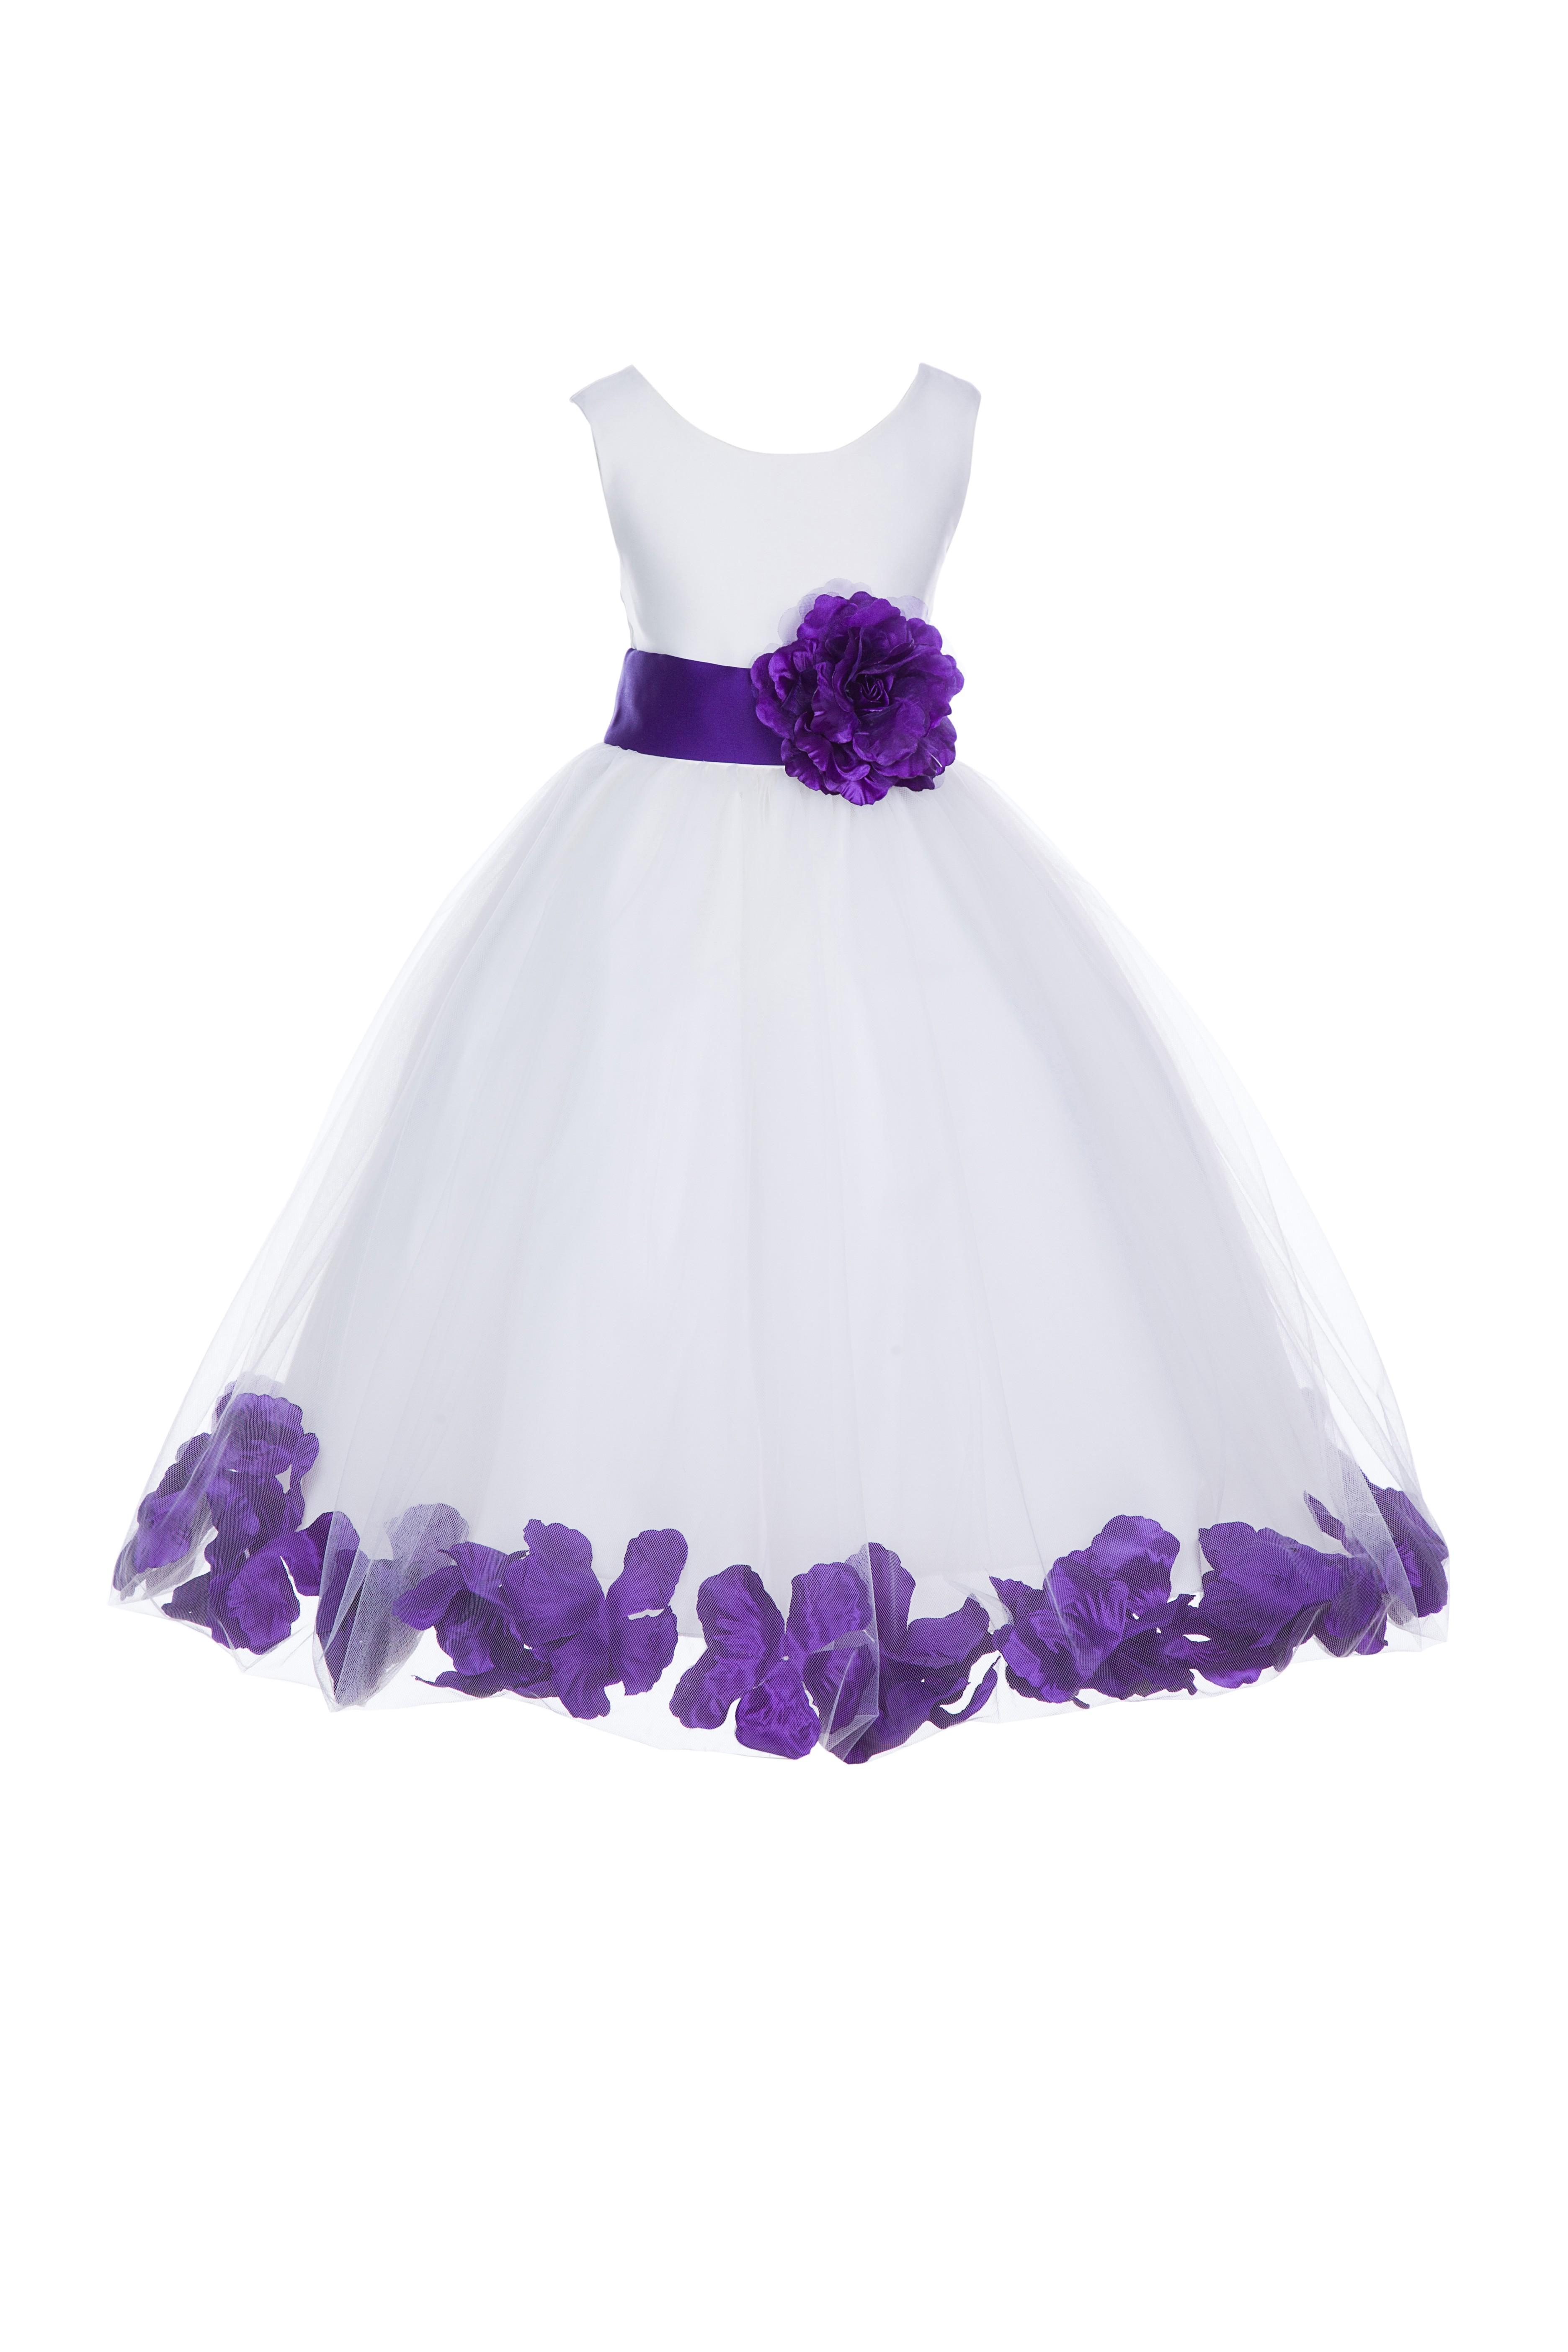 a01e0d5cdd7 Ivory And Cadbury Purple Flower Girl Dresses - Gomes Weine AG